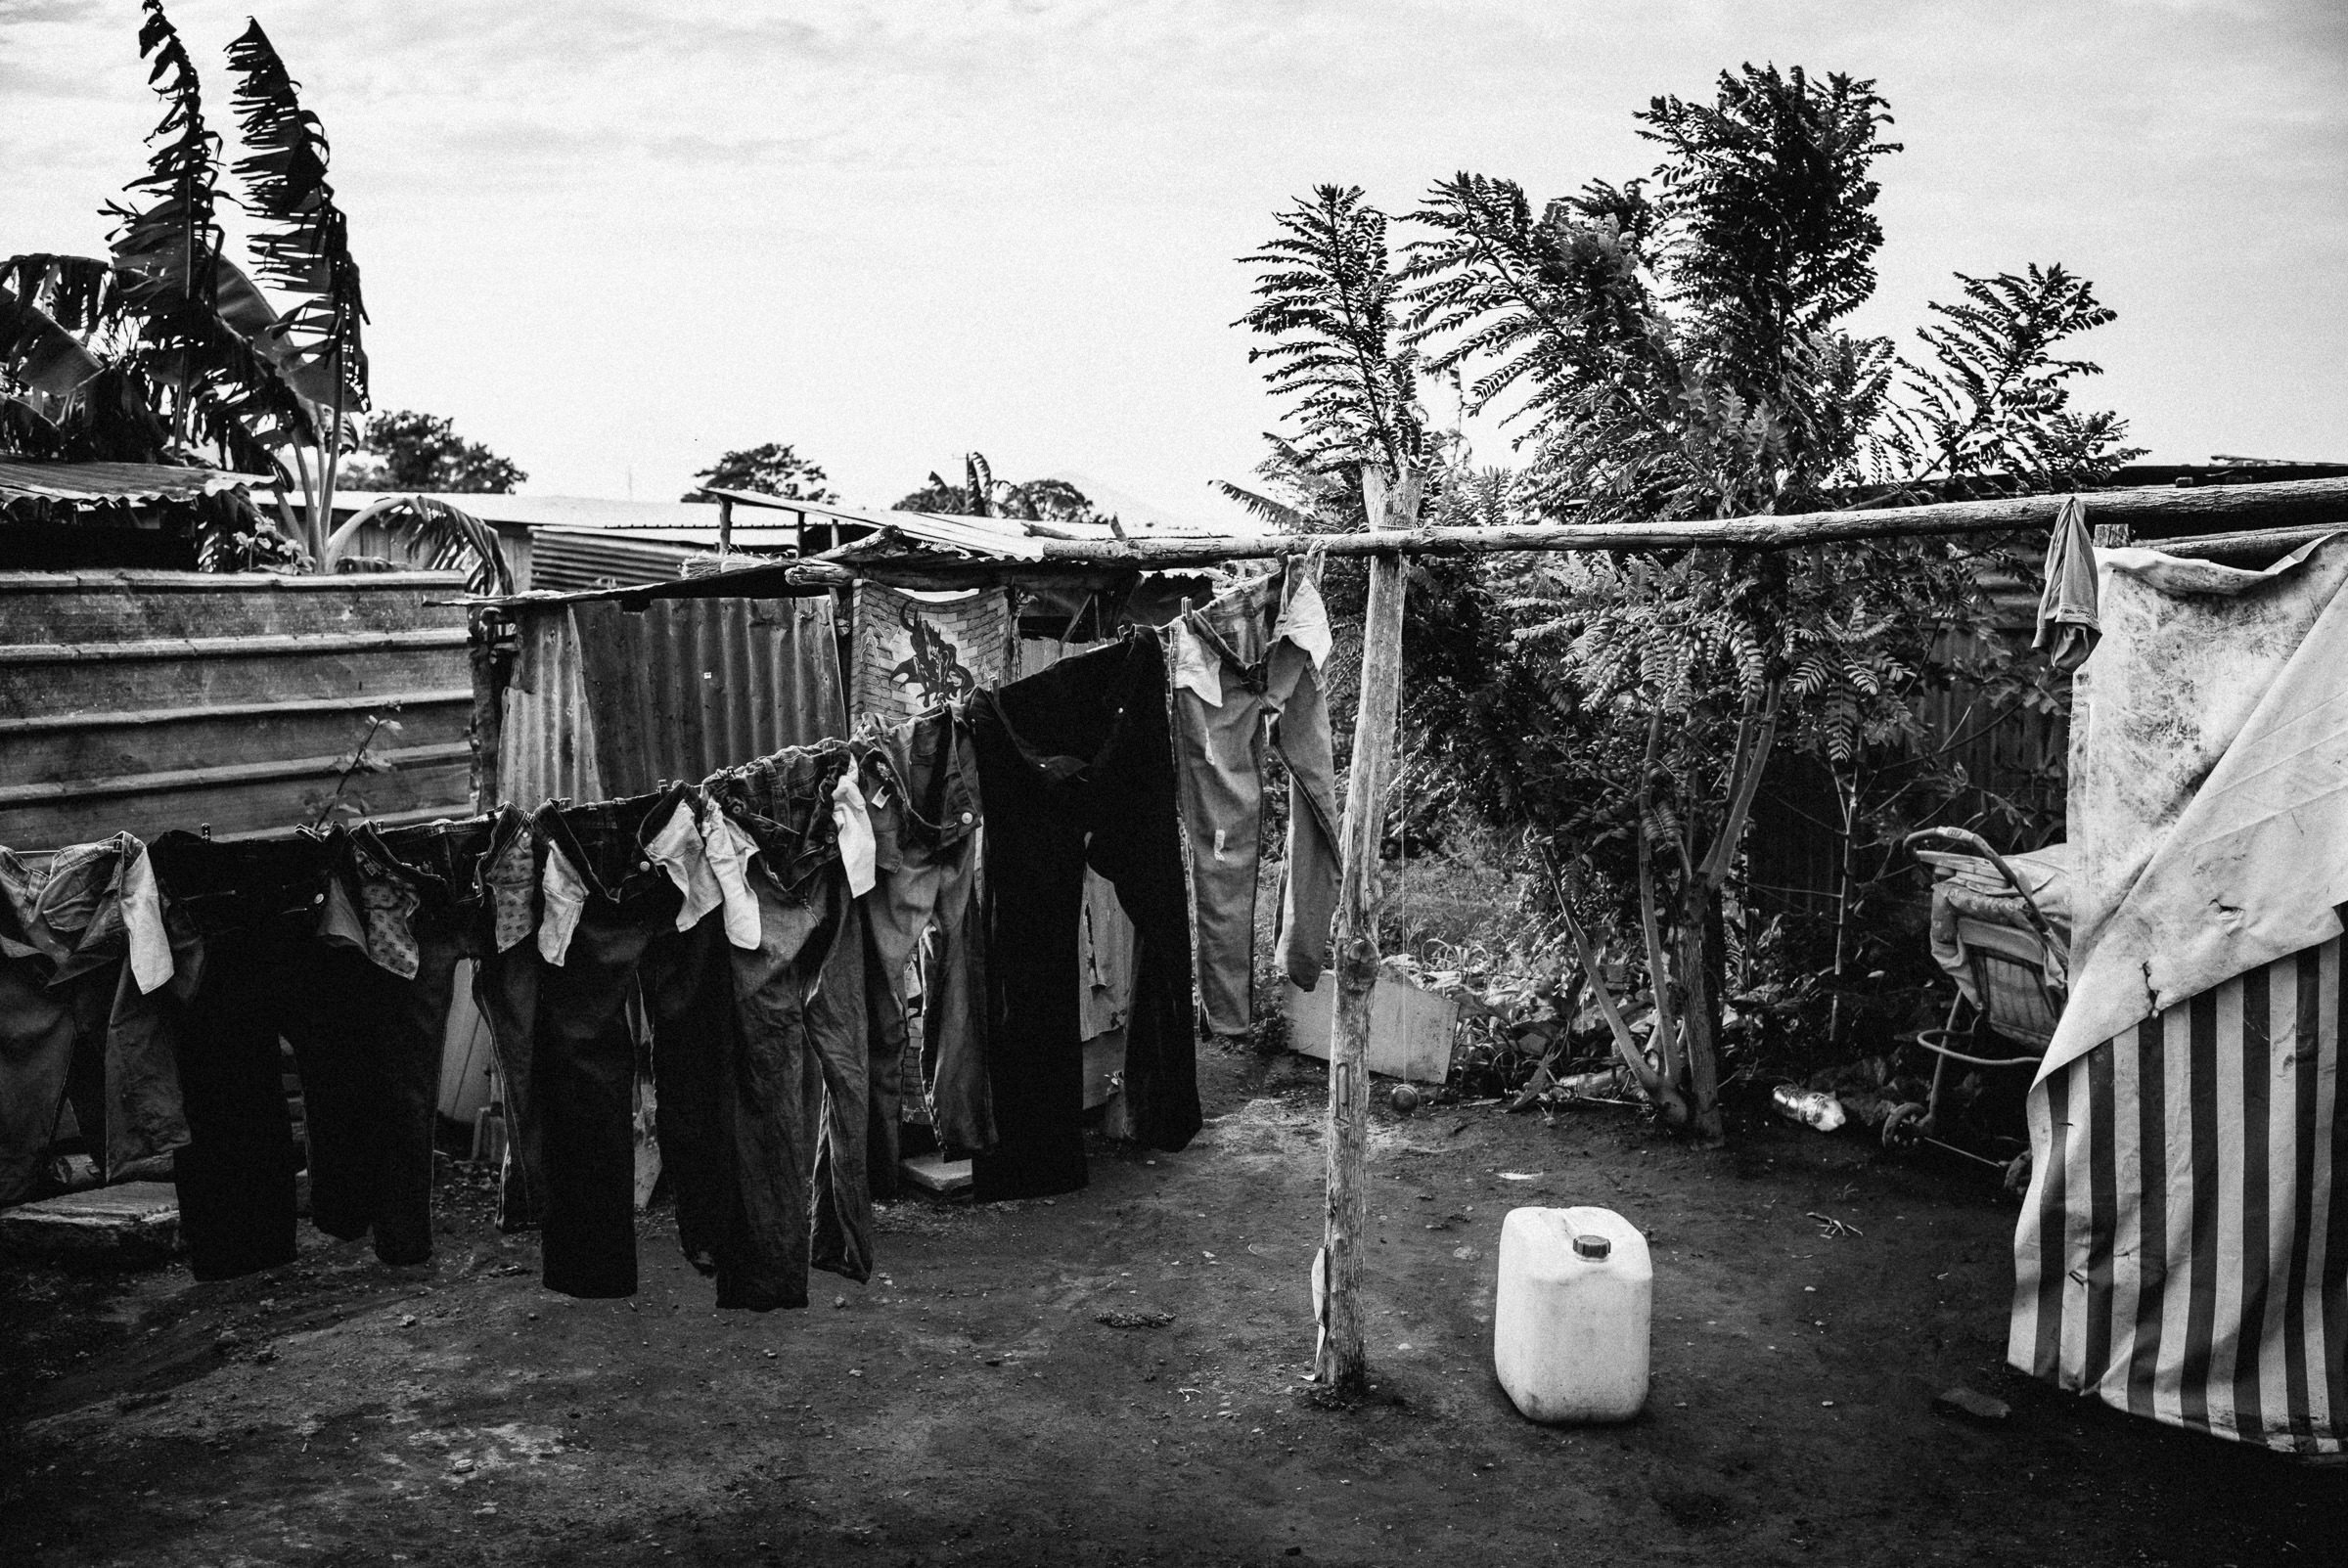 brandon_patoc_travel_photographer_in_nicaragua_0001.jpg